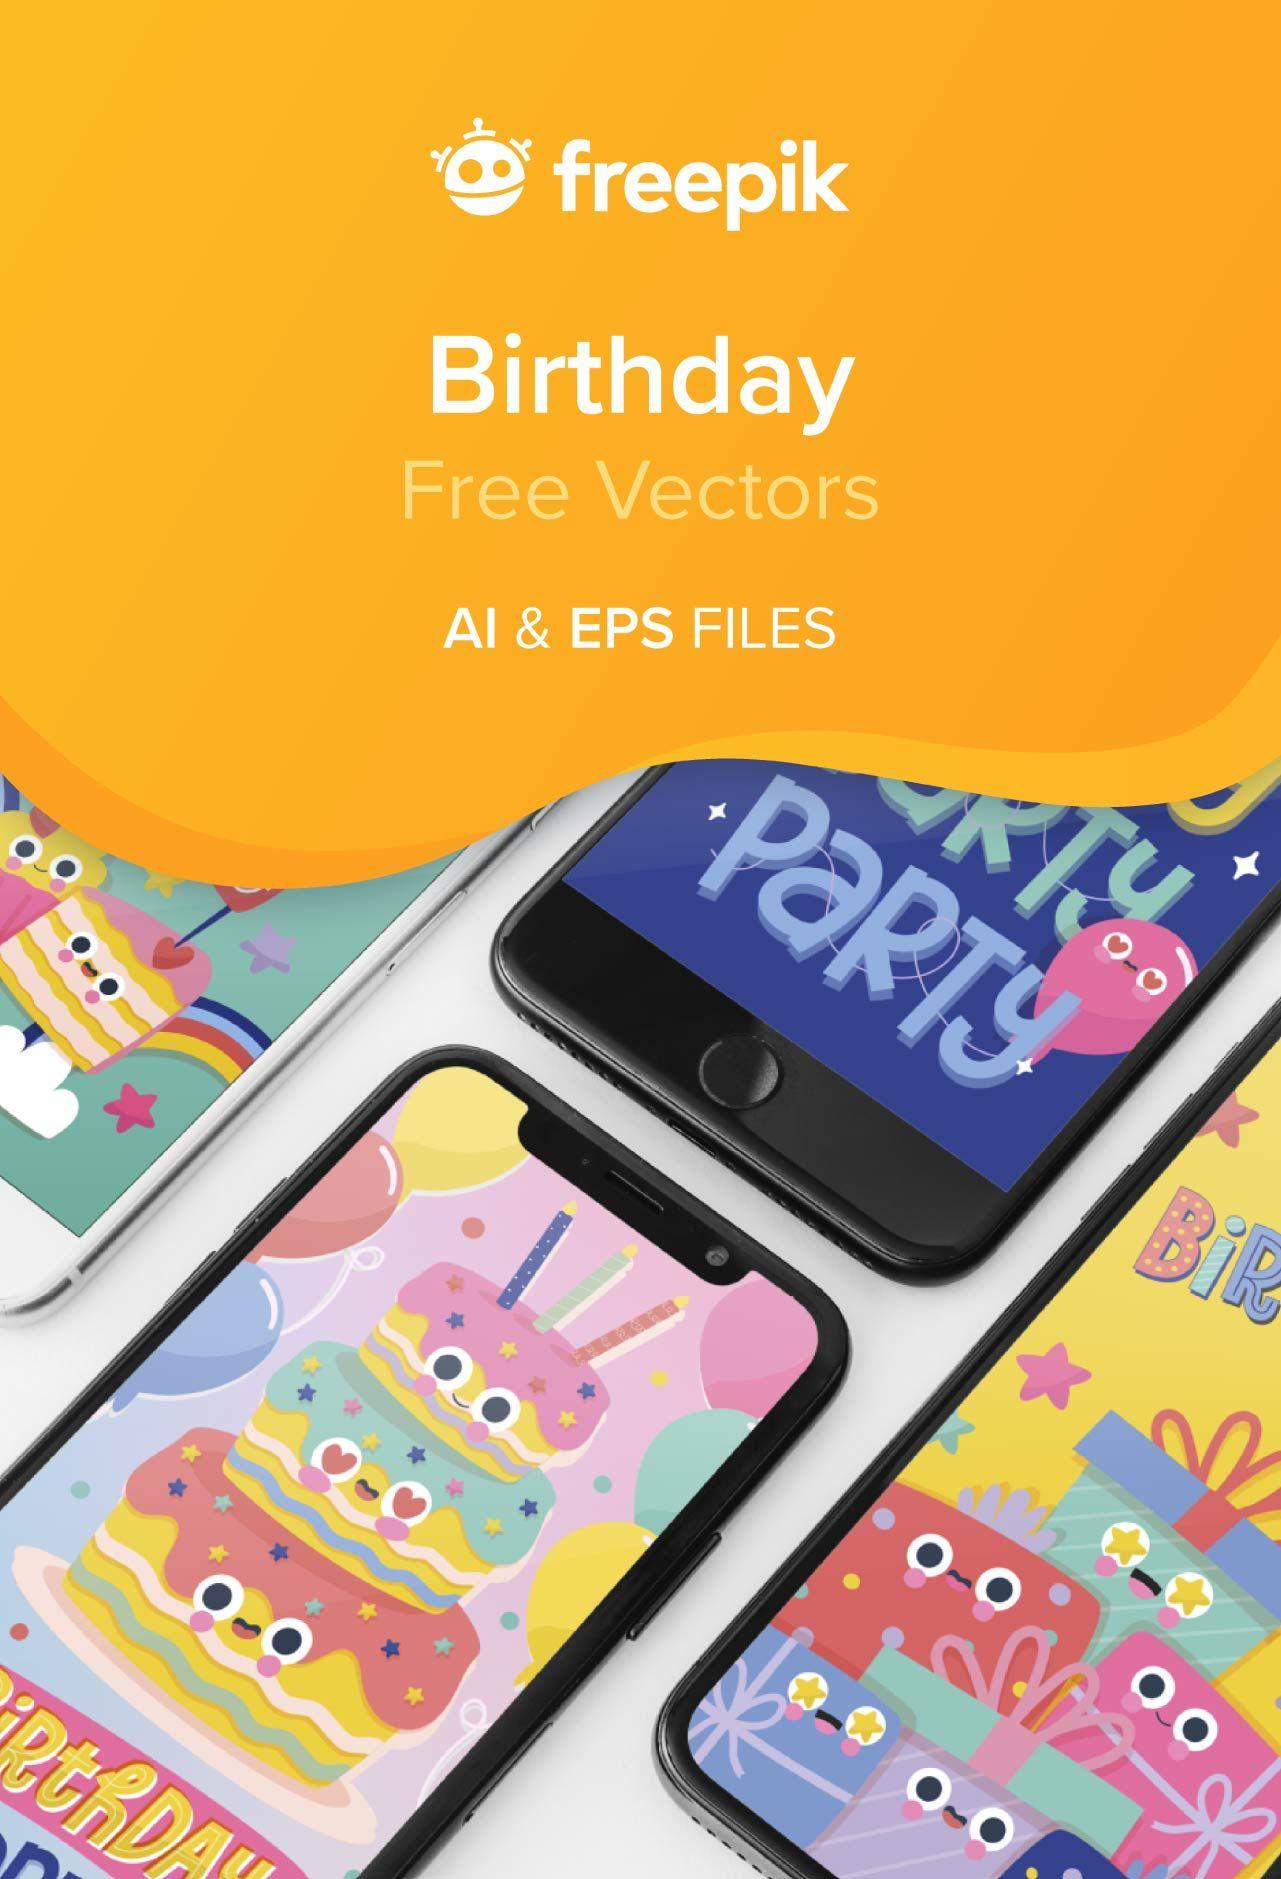 Celebrate freepik company 10th birthday with this freebie